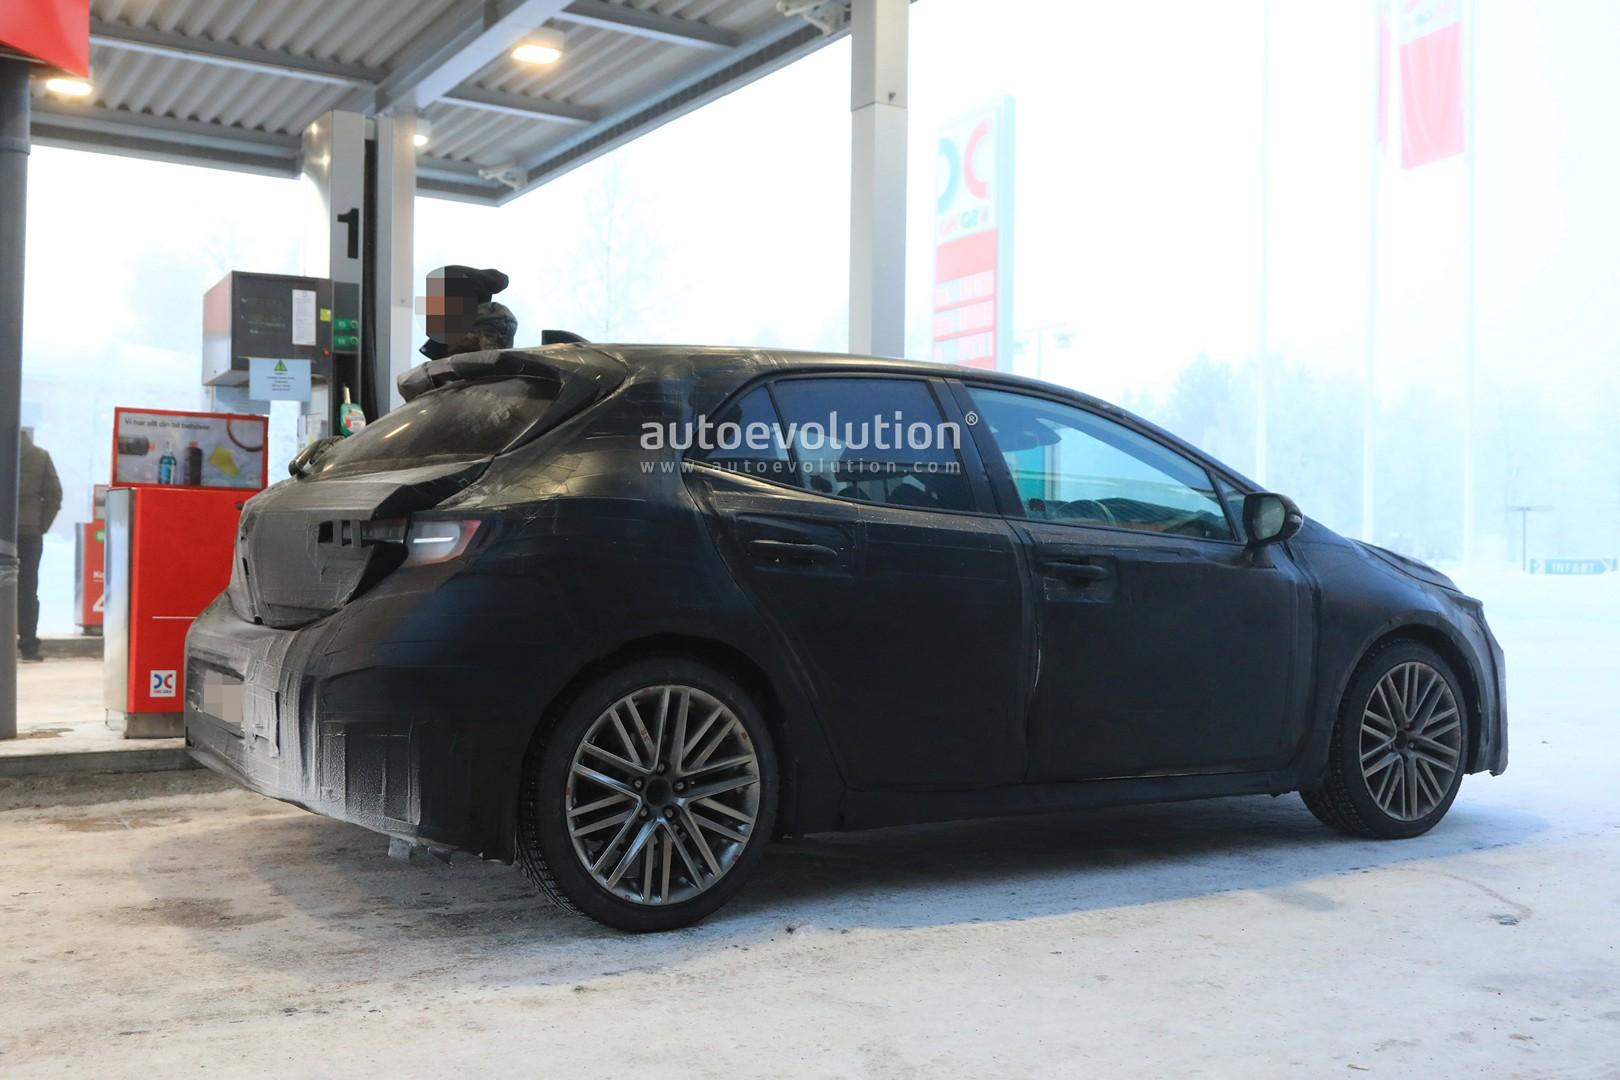 2019 Toyota Auris Reveals New Interior And Angular Design In Latest Spyshots Autoevolution